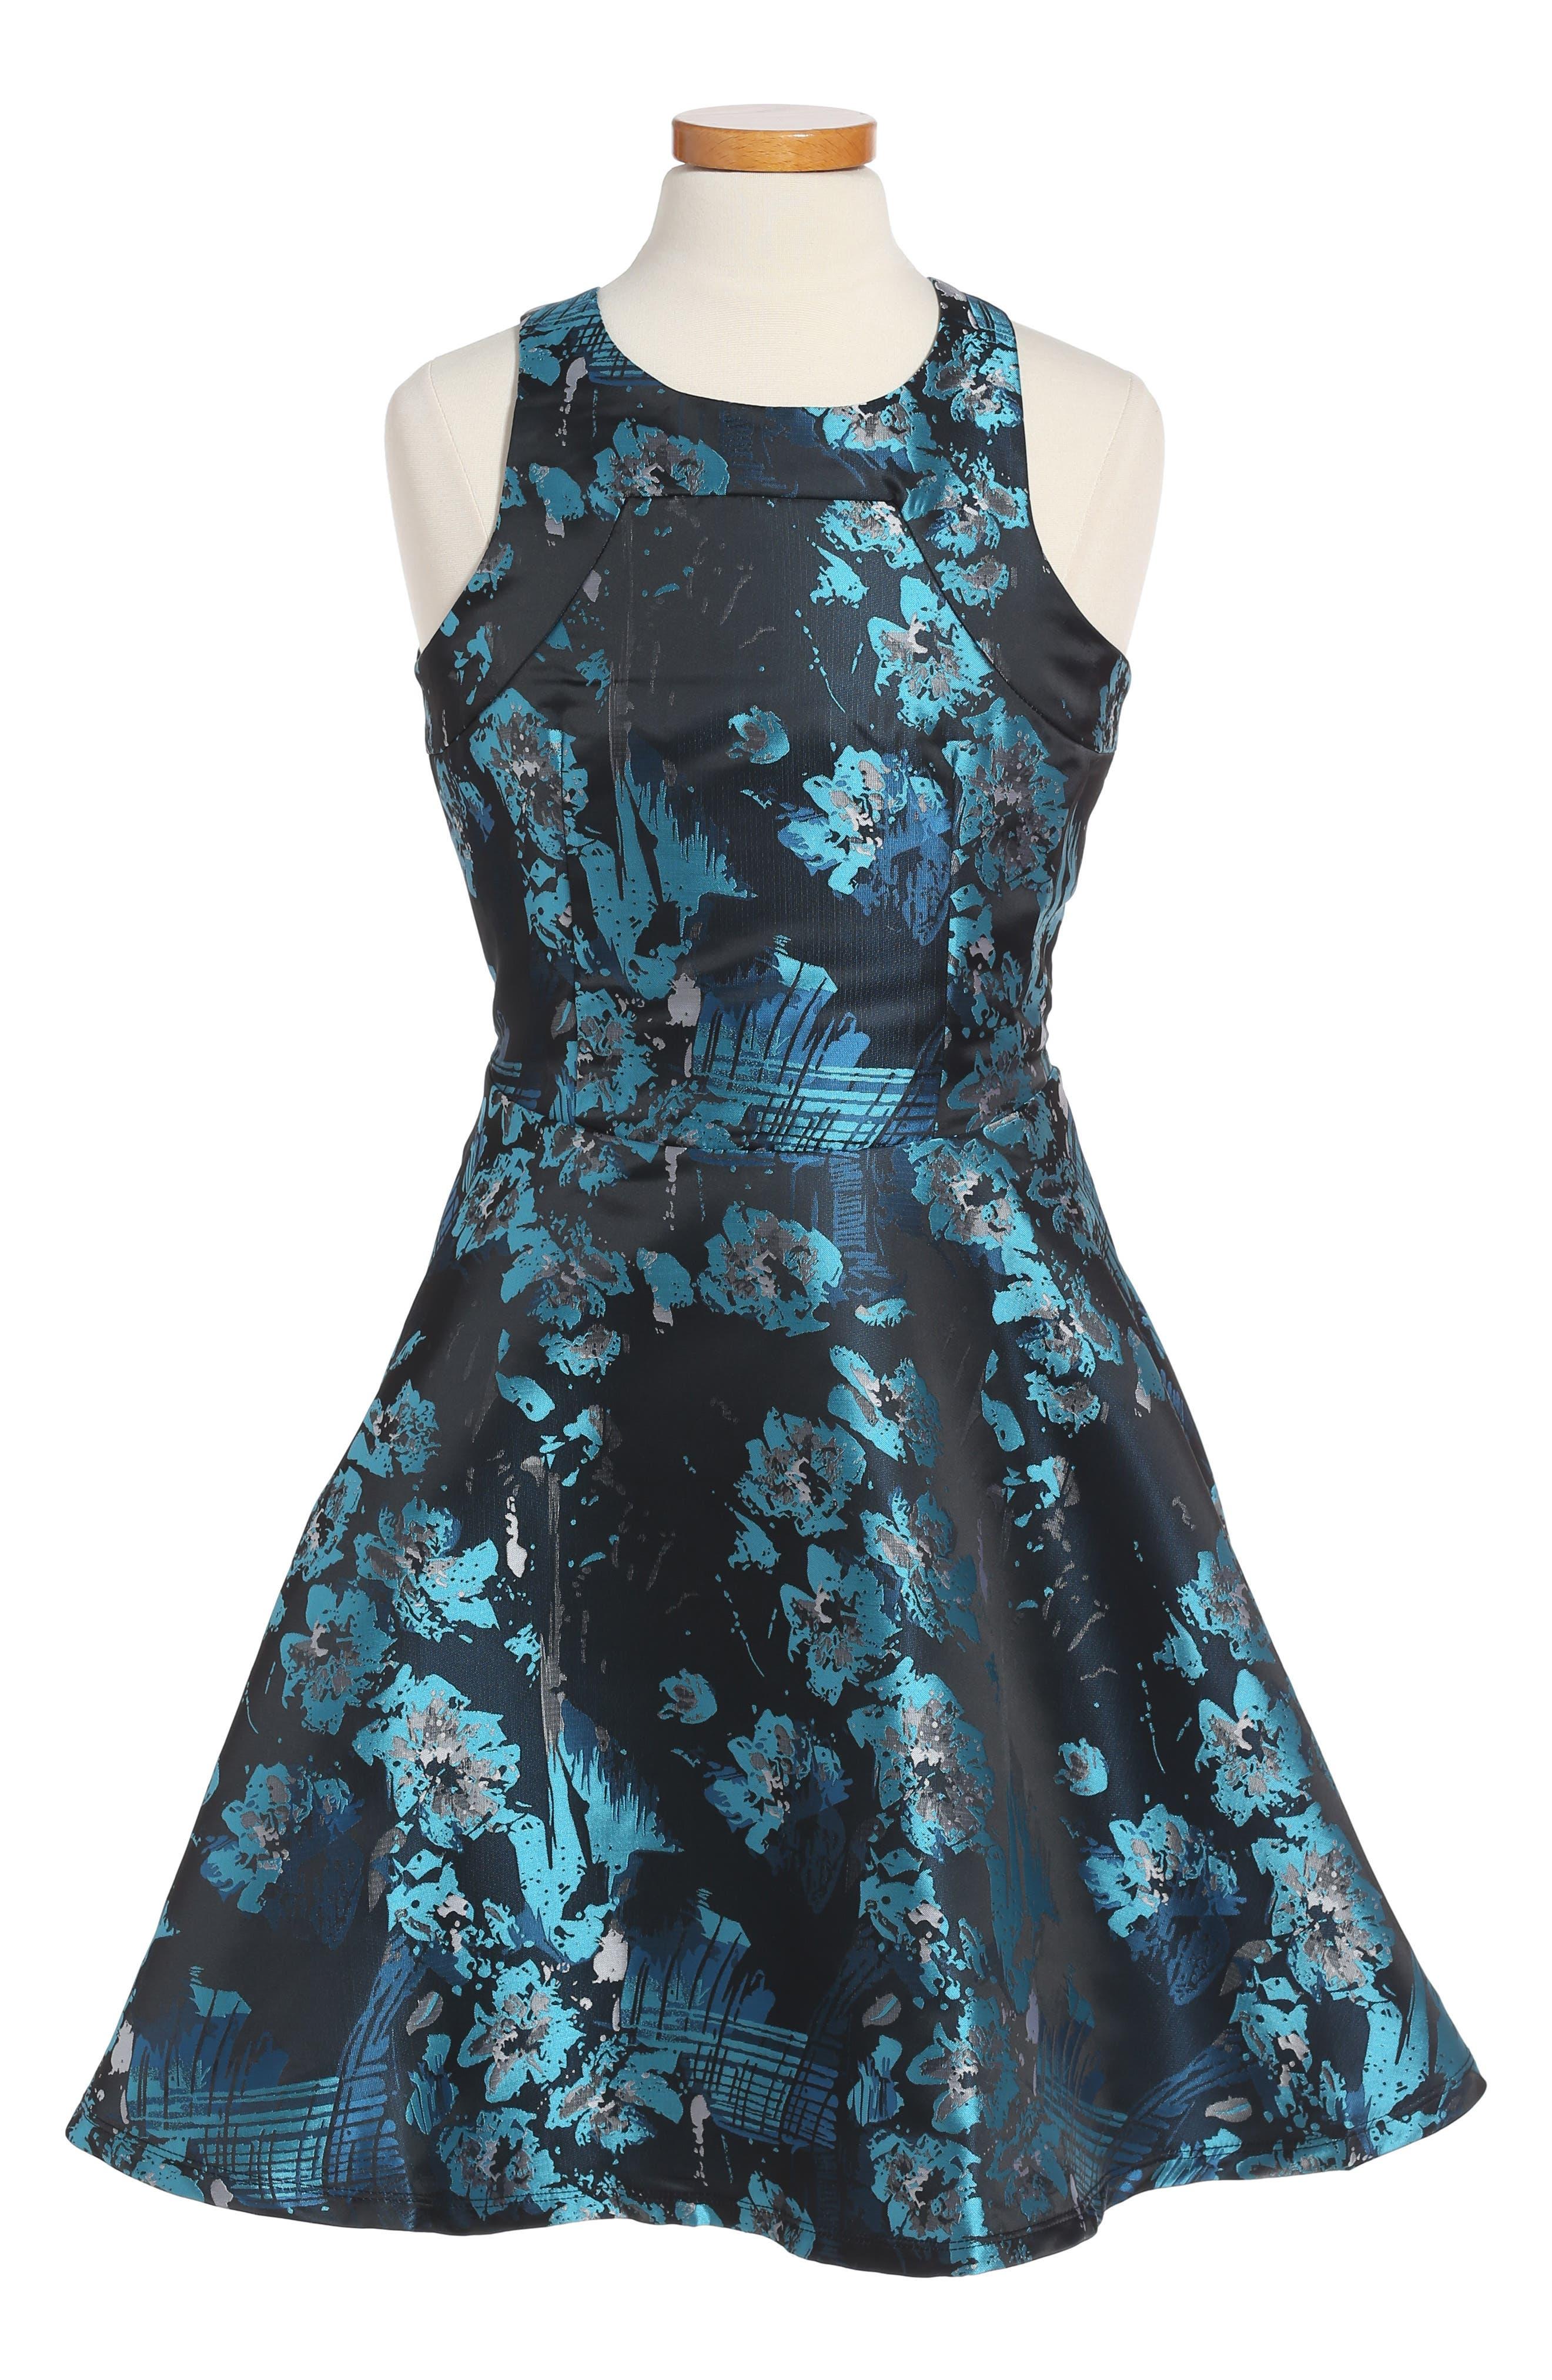 MISS BEHAVE Floral Print Sleeveless Dress